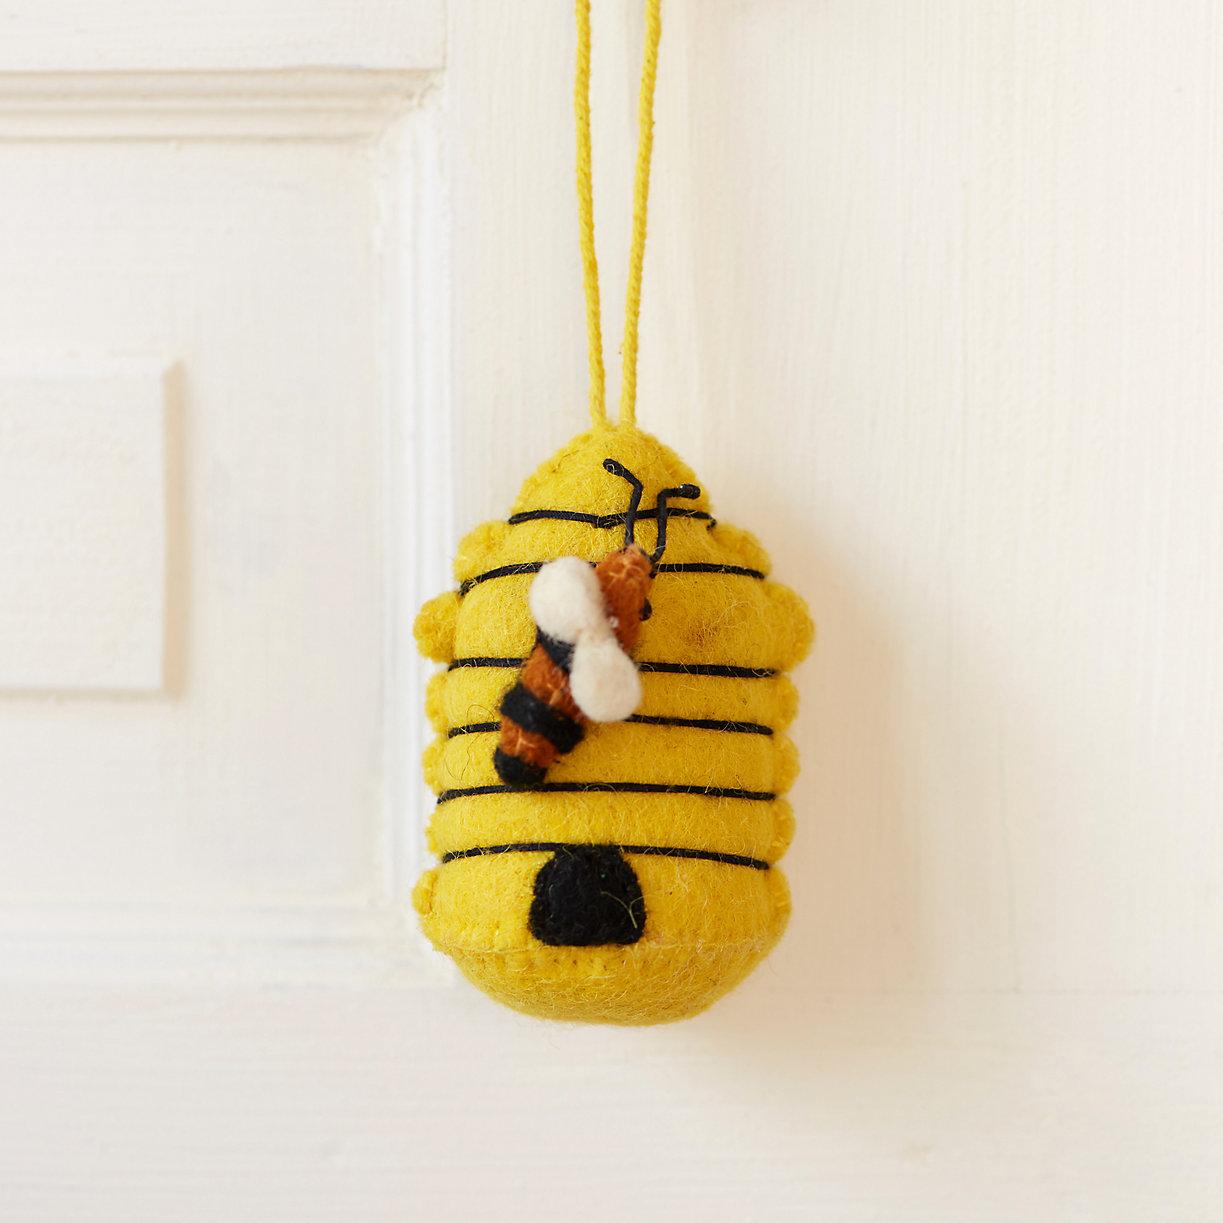 Beehive ornament - Felt Beehive Ornament Loading Zoom